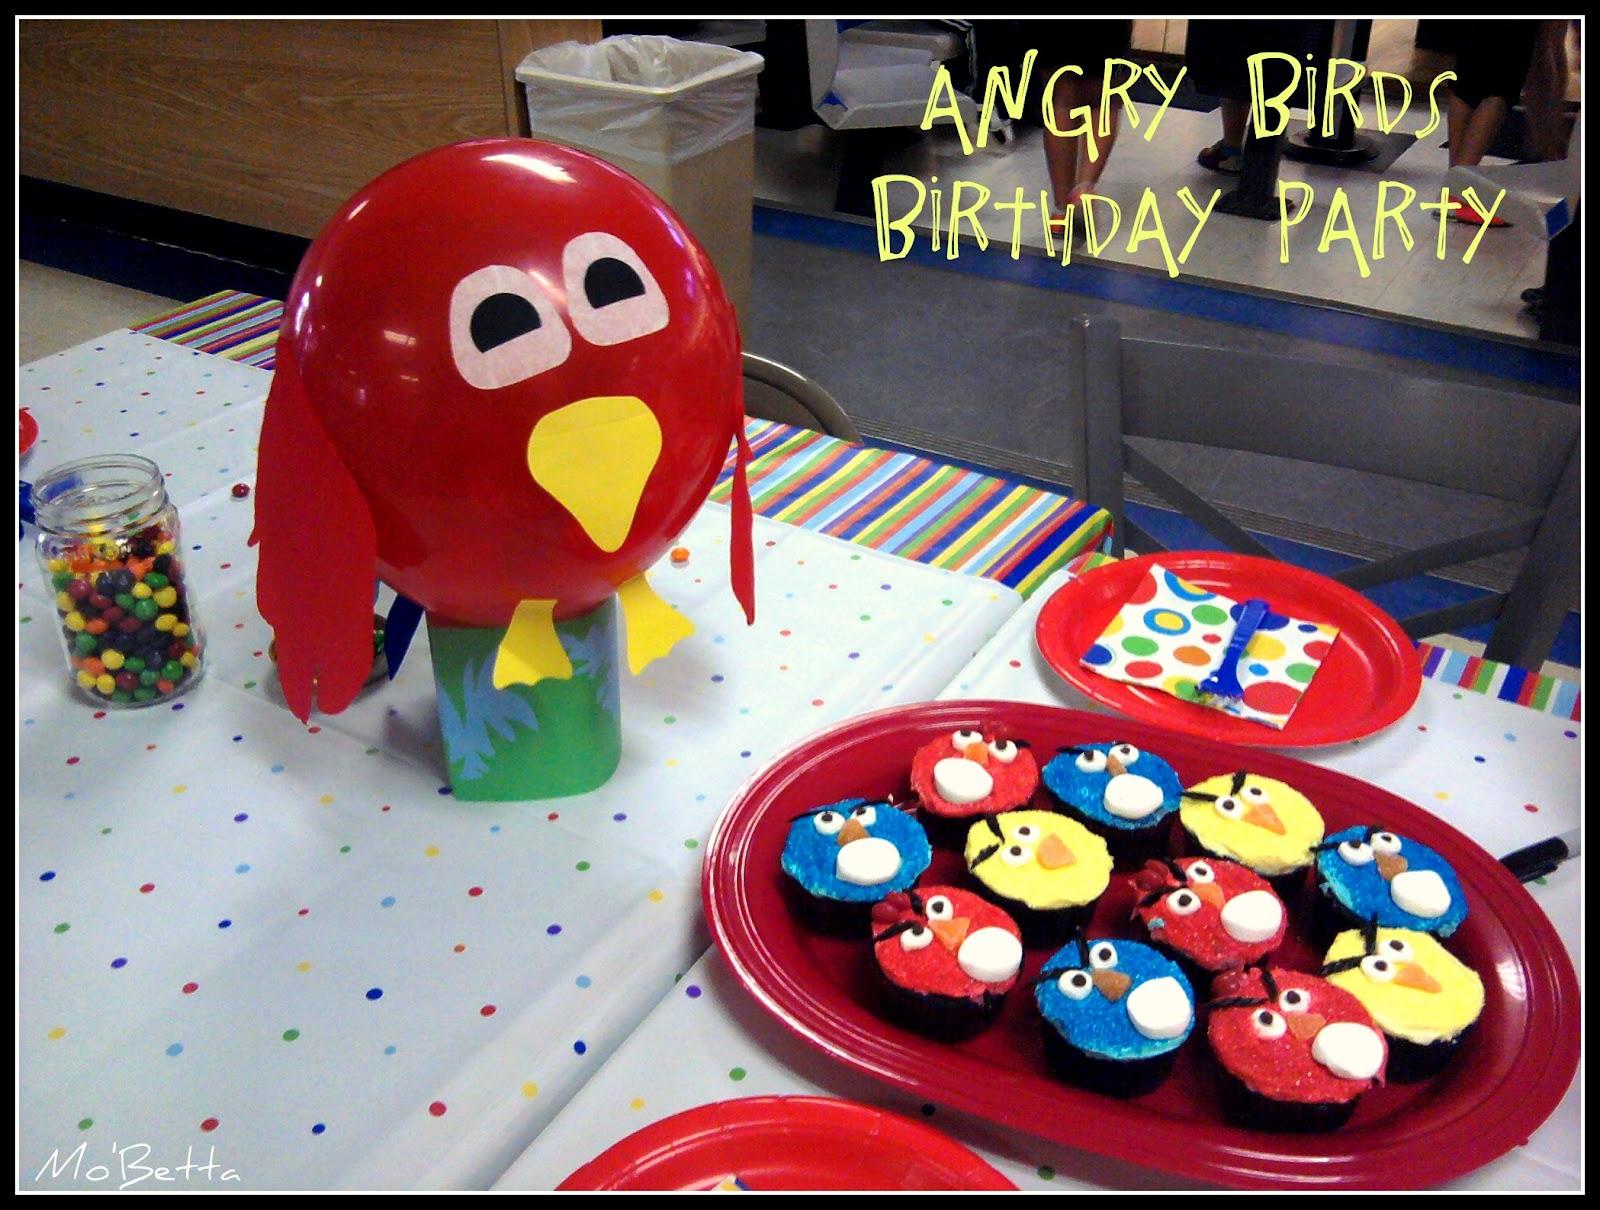 Makin' It Mo' Betta: One Angry (Bird) Birthday Party